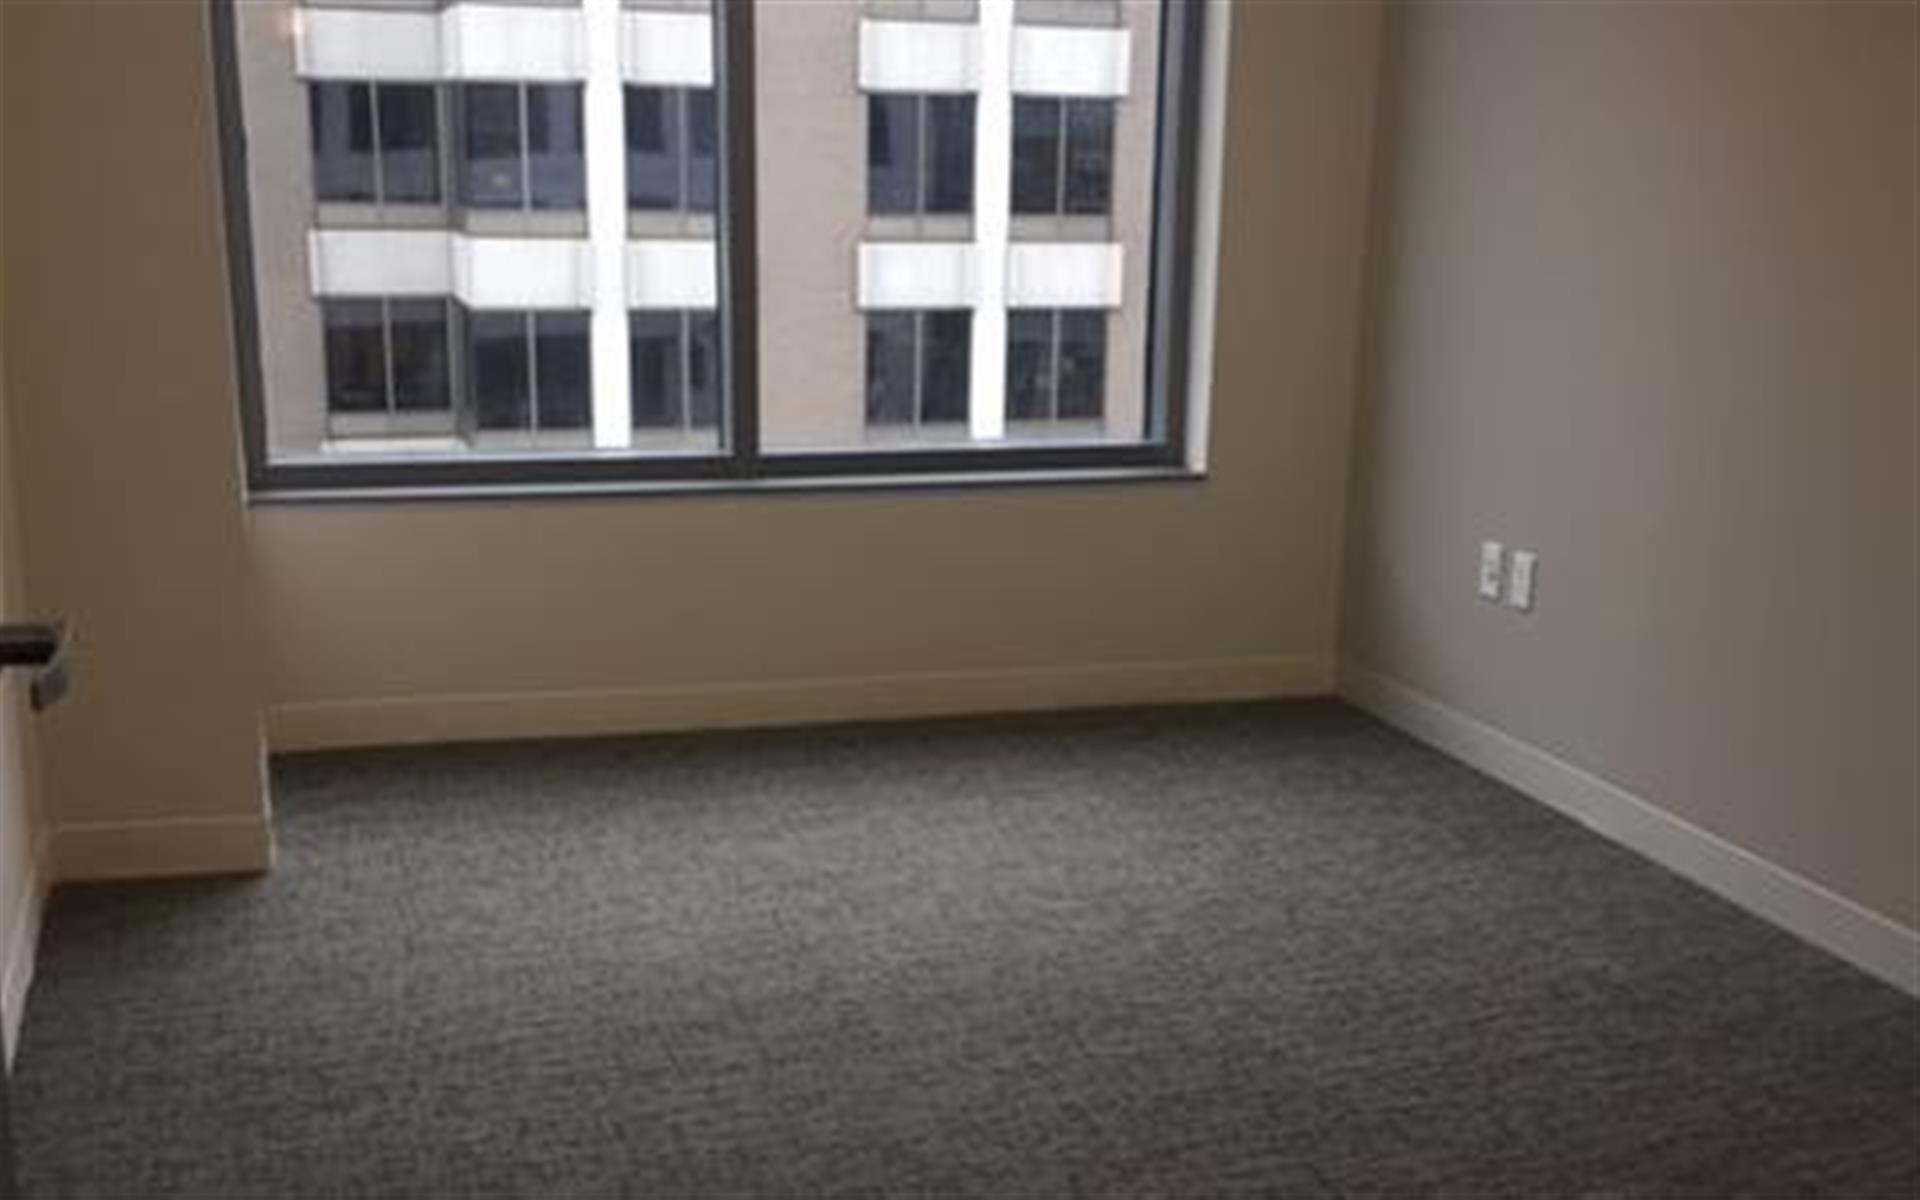 Centurion Center DC - Suite E16 - Windowed Office